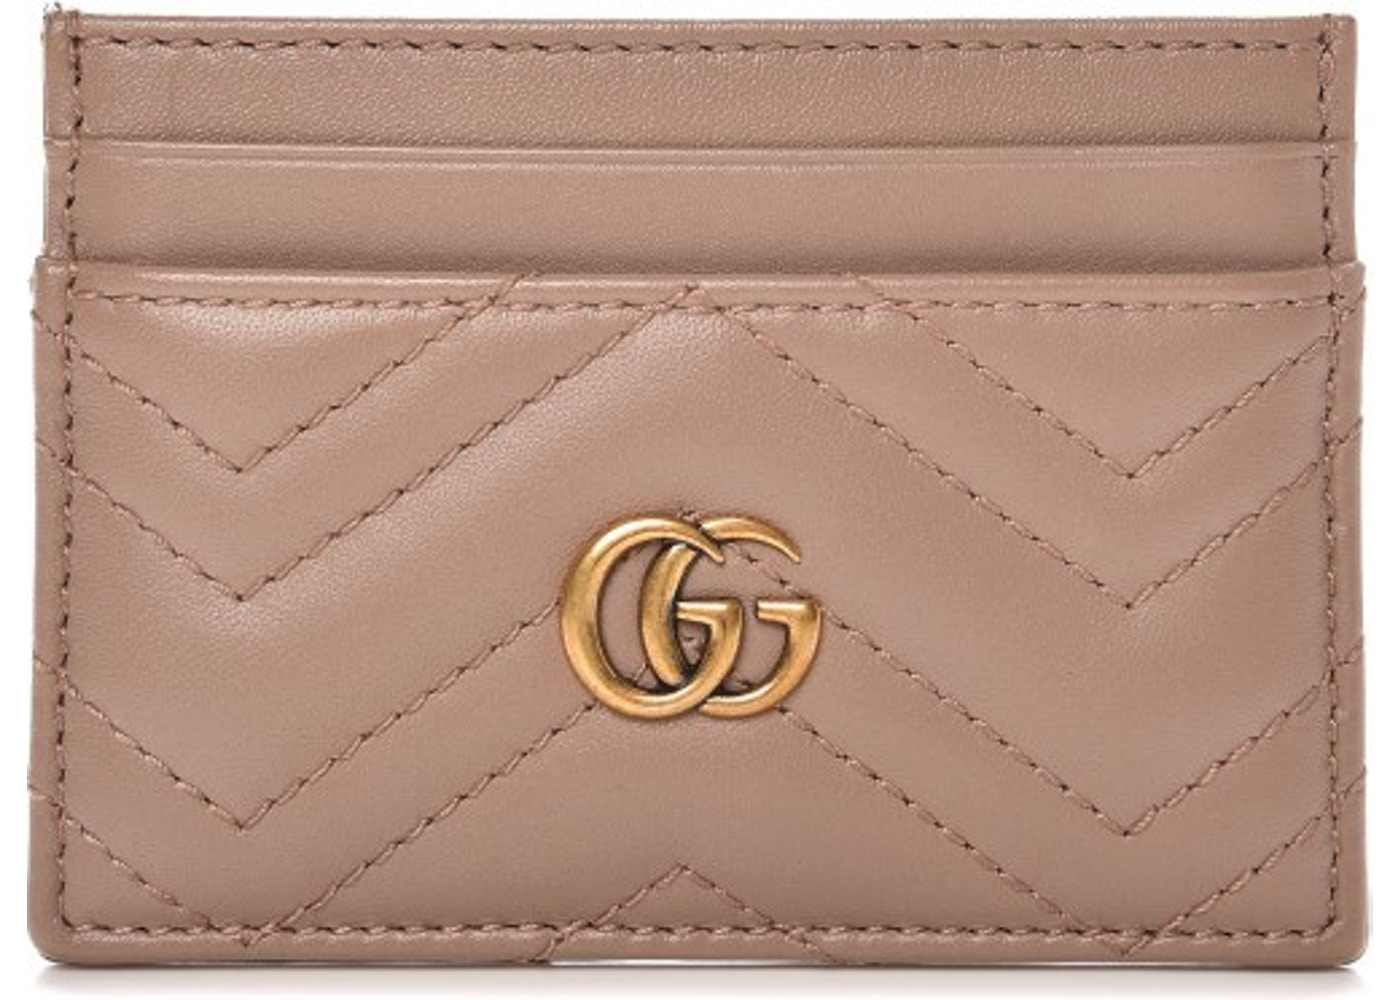 5c767f3a8 Gucci Marmont Card Case Monogram Matelasse GG Porcelain Rose. Monogram Matelasse  GG Porcelain Rose